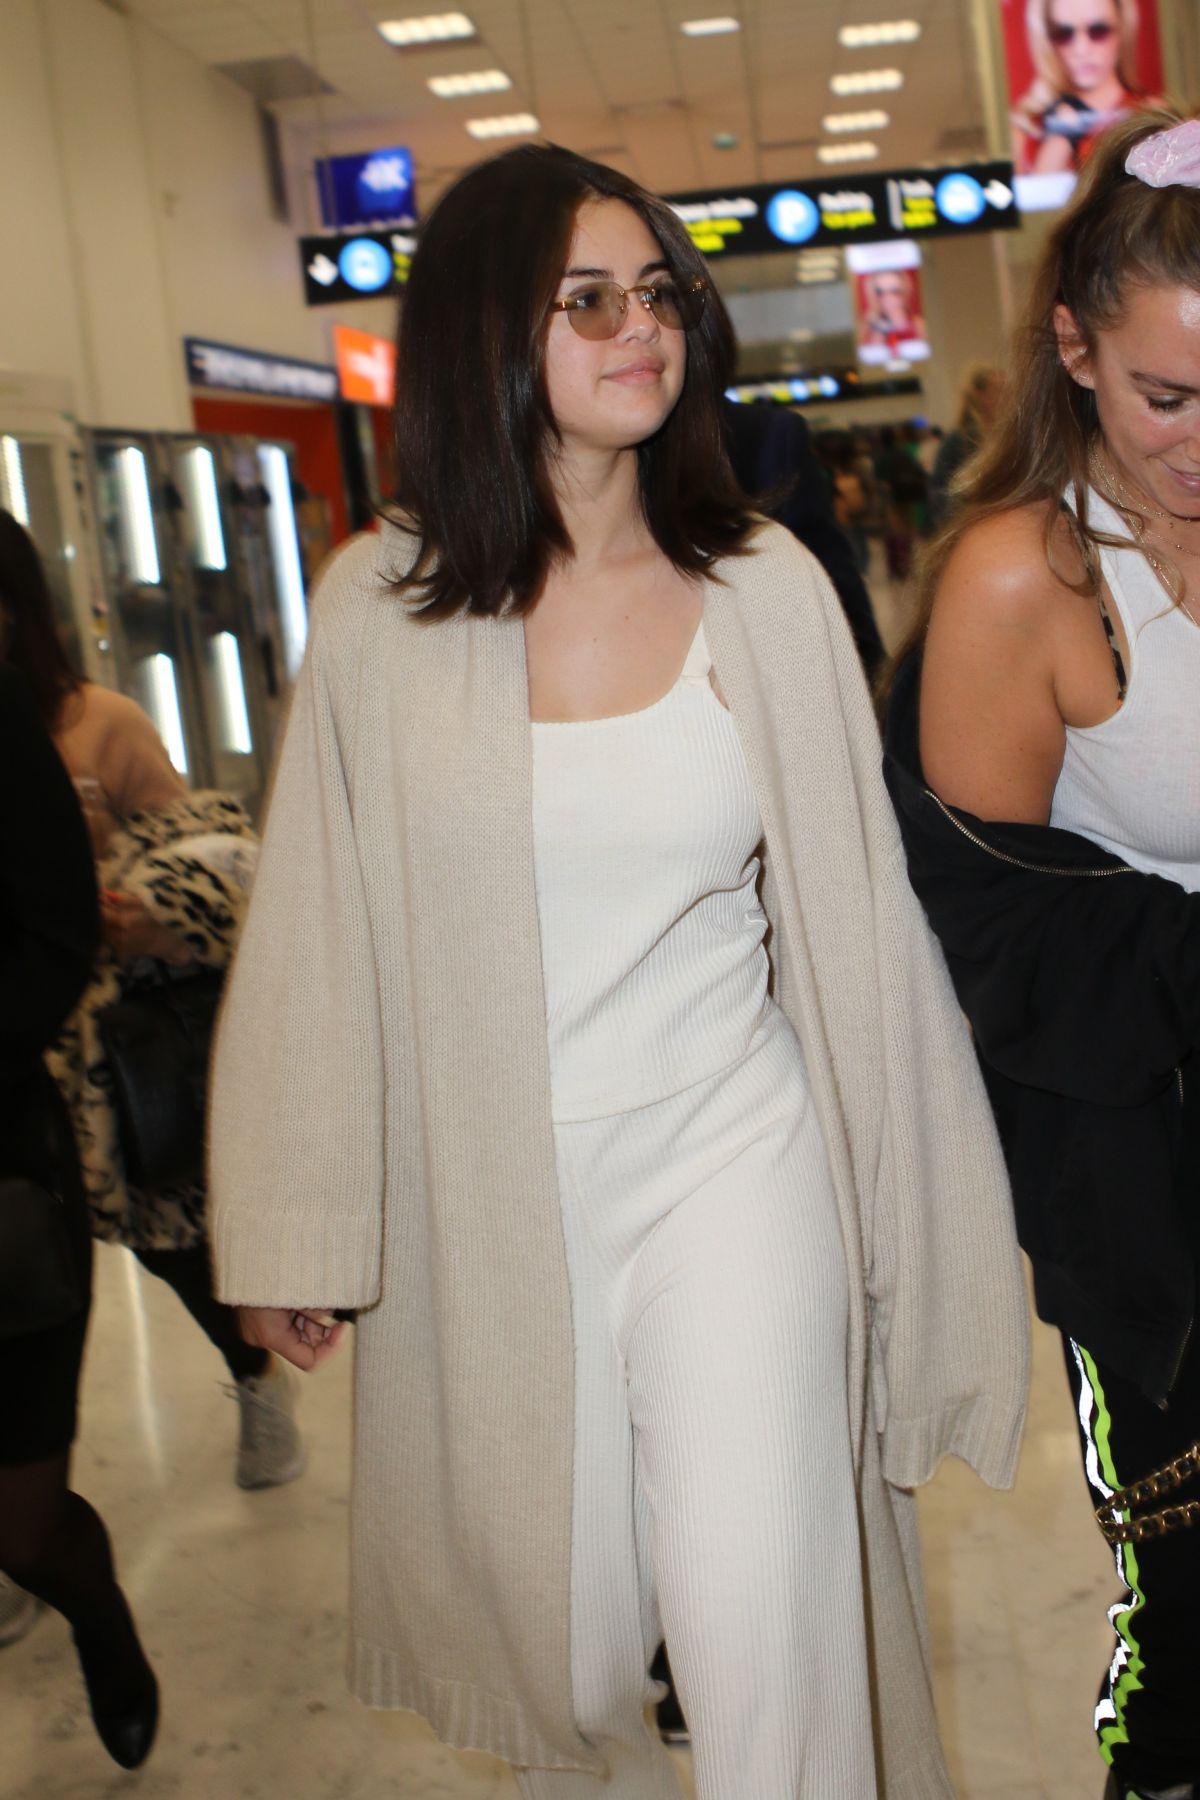 SELENA GOMEZ Arrives at Nice Airport 05/13/2019 - HawtCelebs  SELENA GOMEZ Ar...